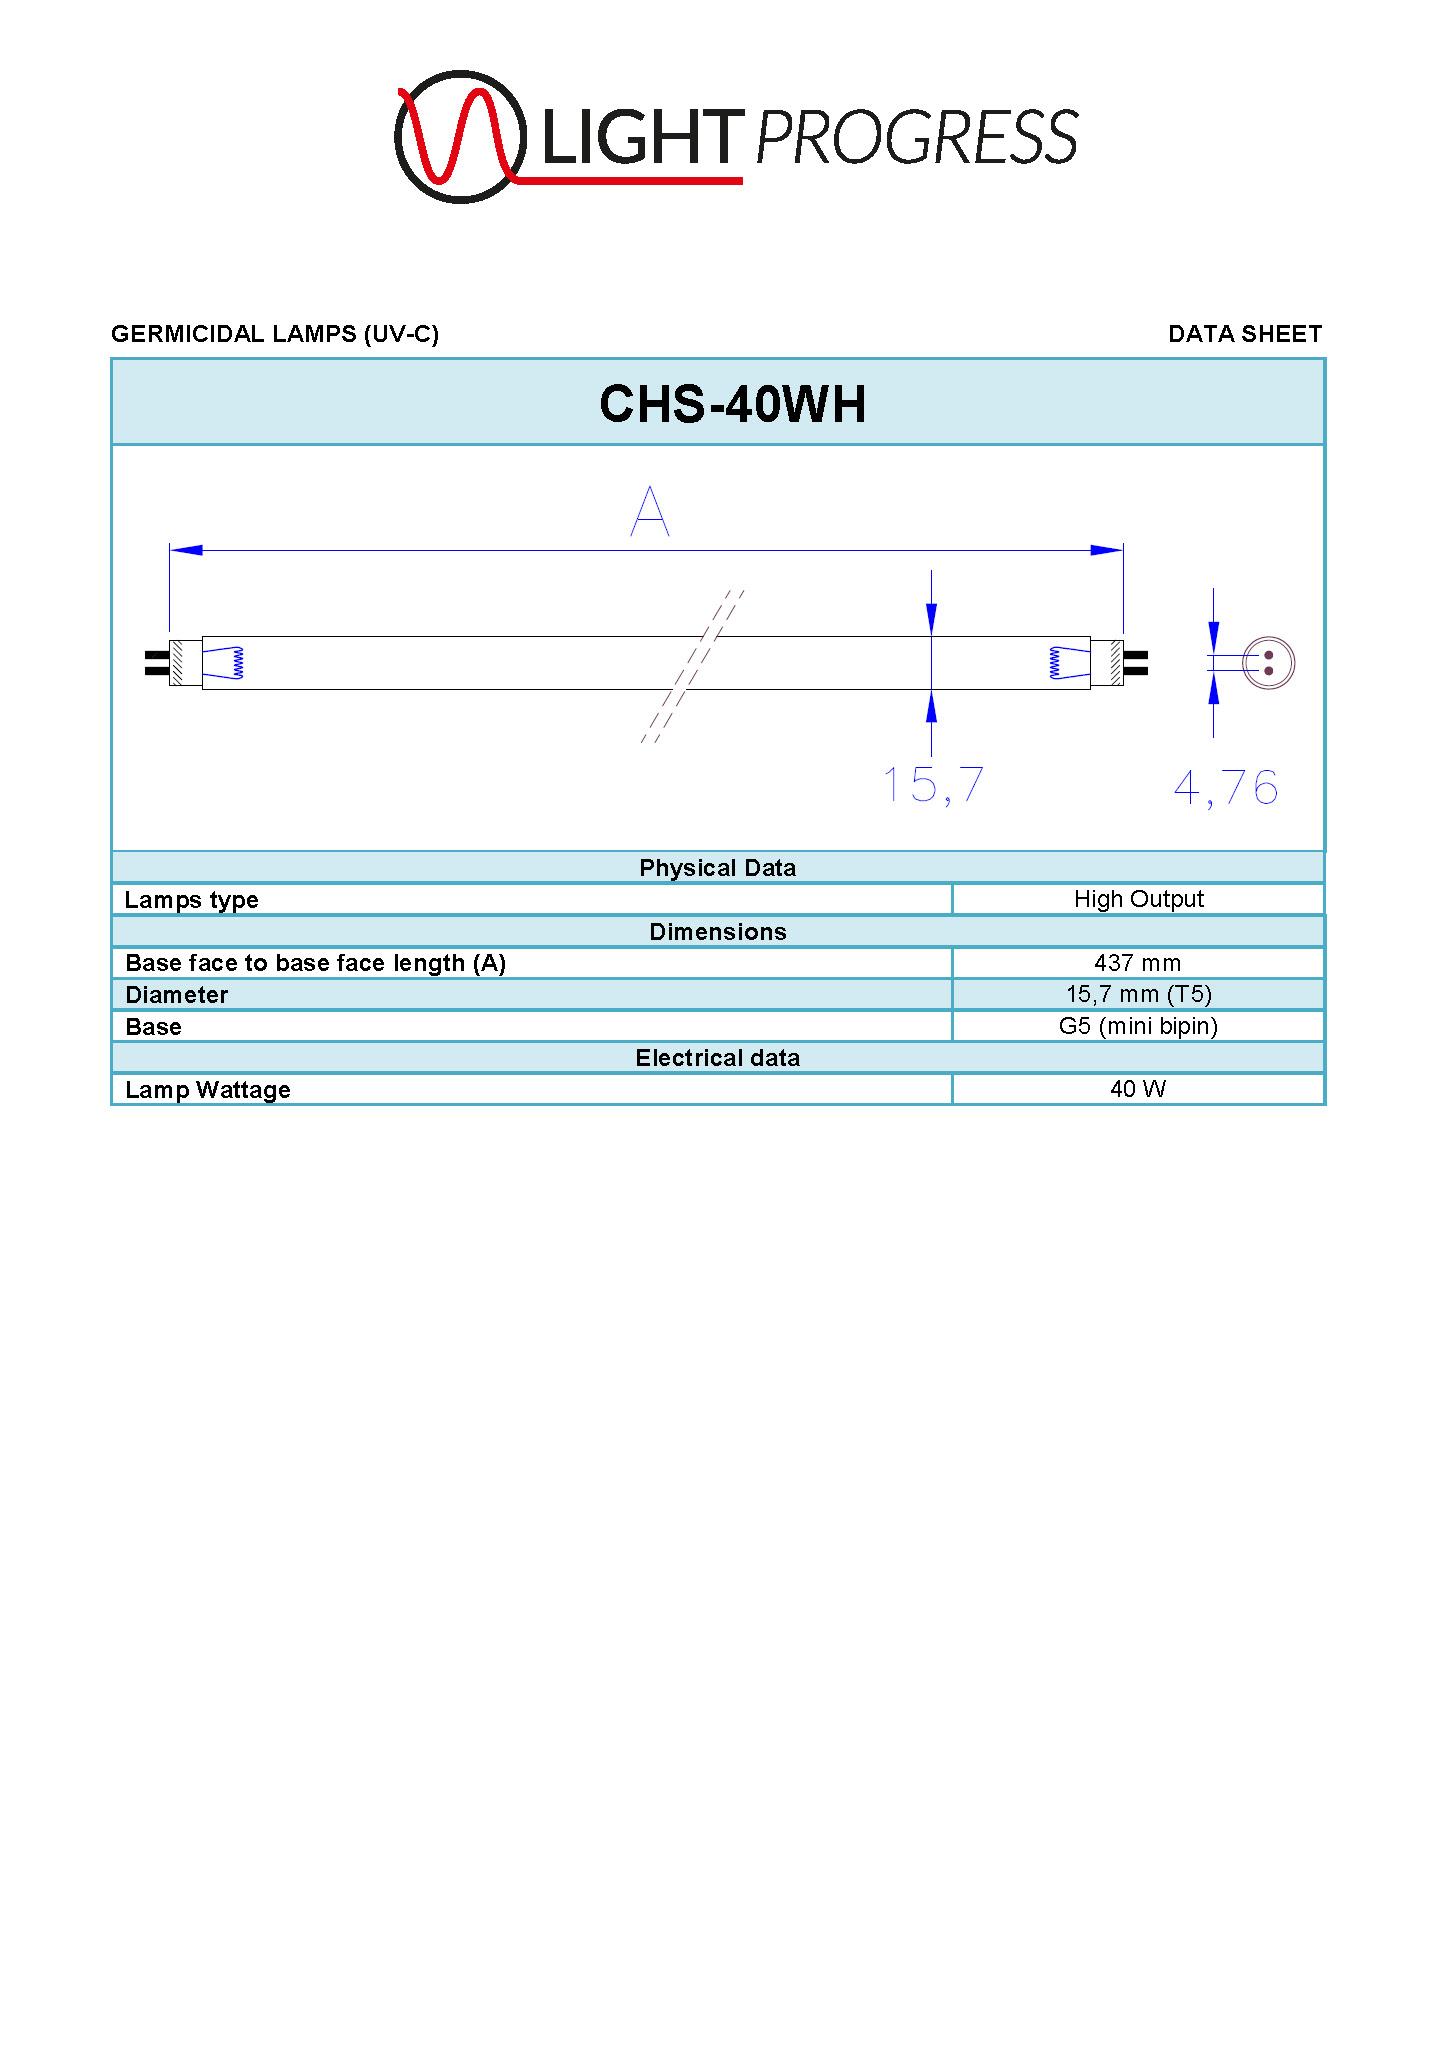 LIGHT PROGRESS CHS-40WH